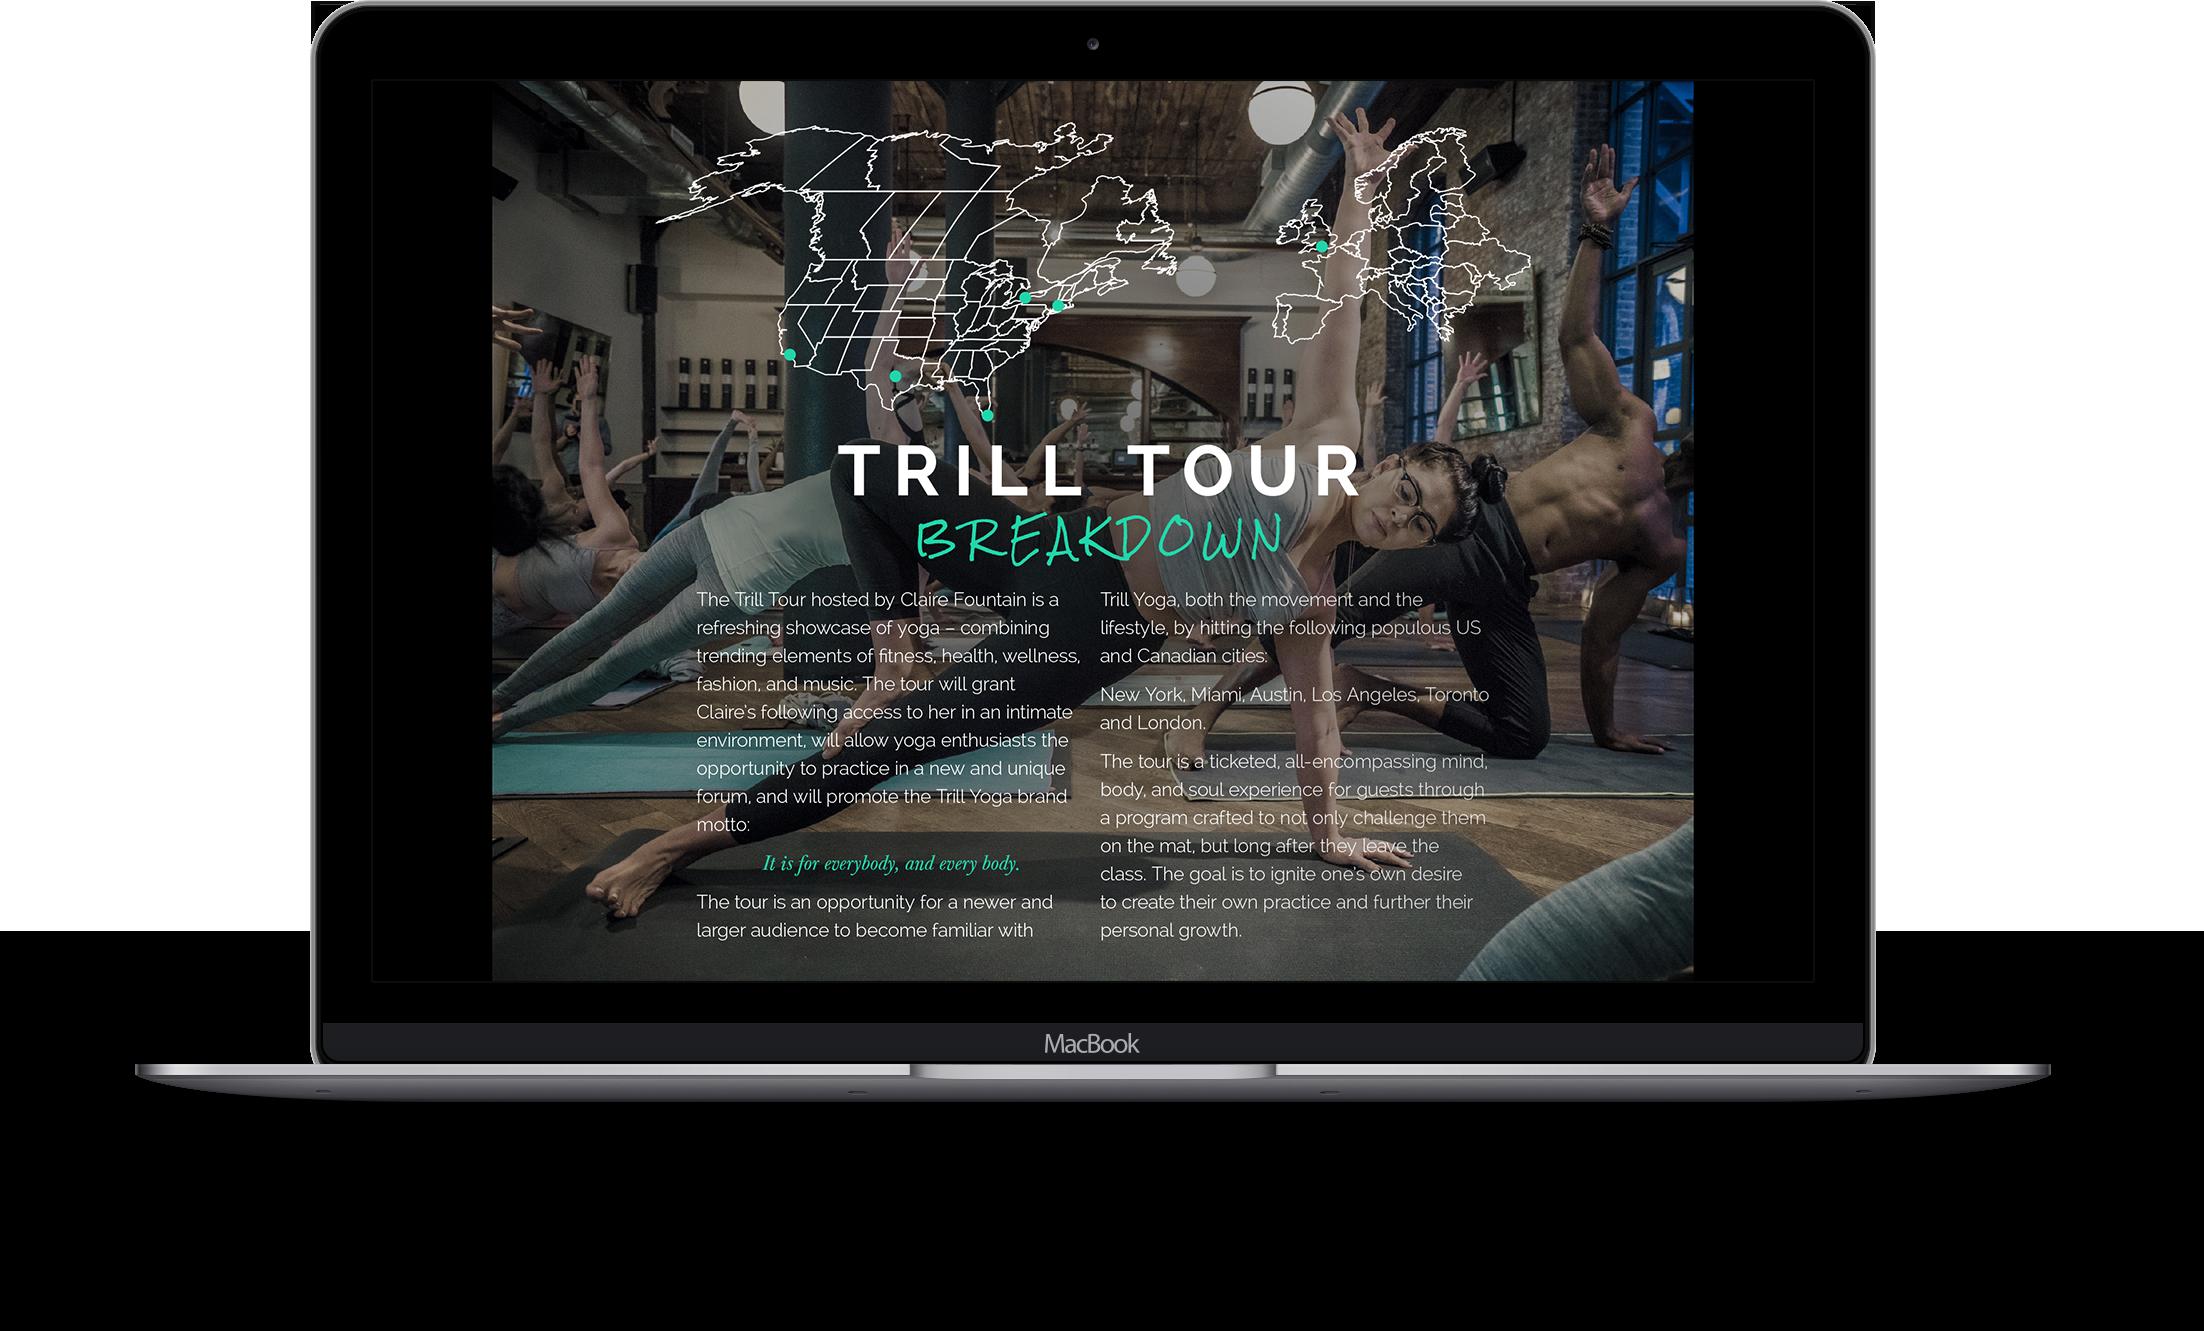 deck_trill-tour-03.png